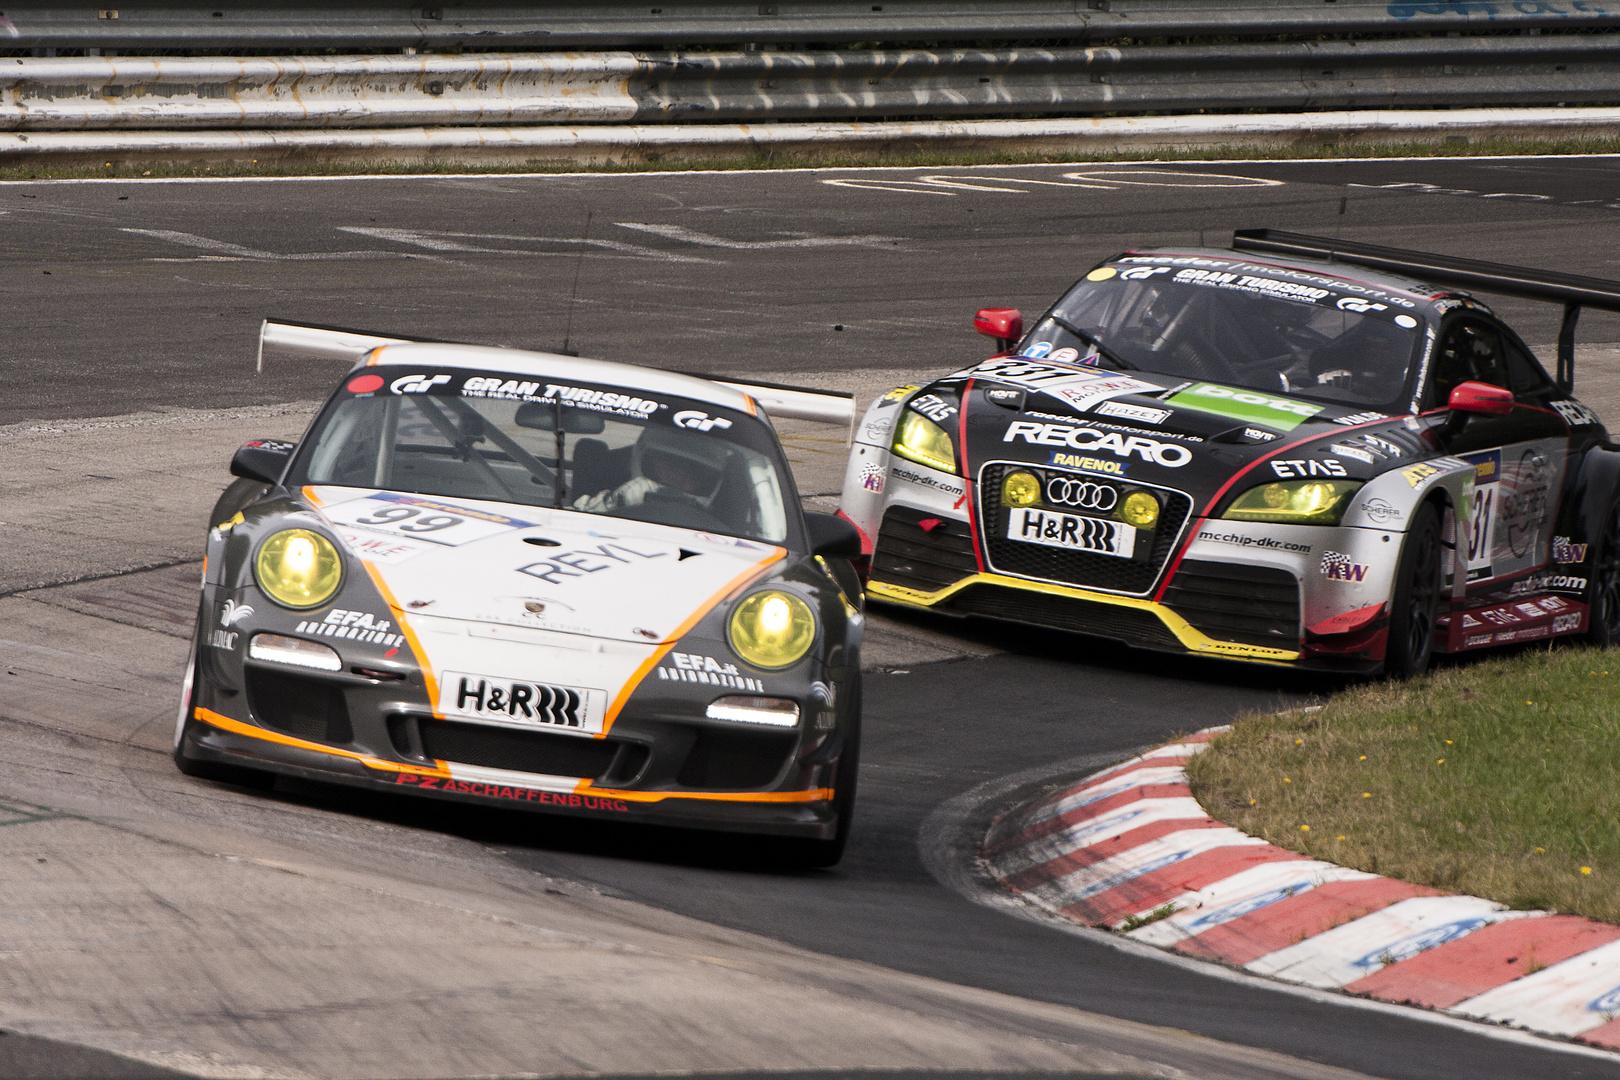 Nürburgring VLN 28.09.2013 - Porsche 911 GT3 Cup